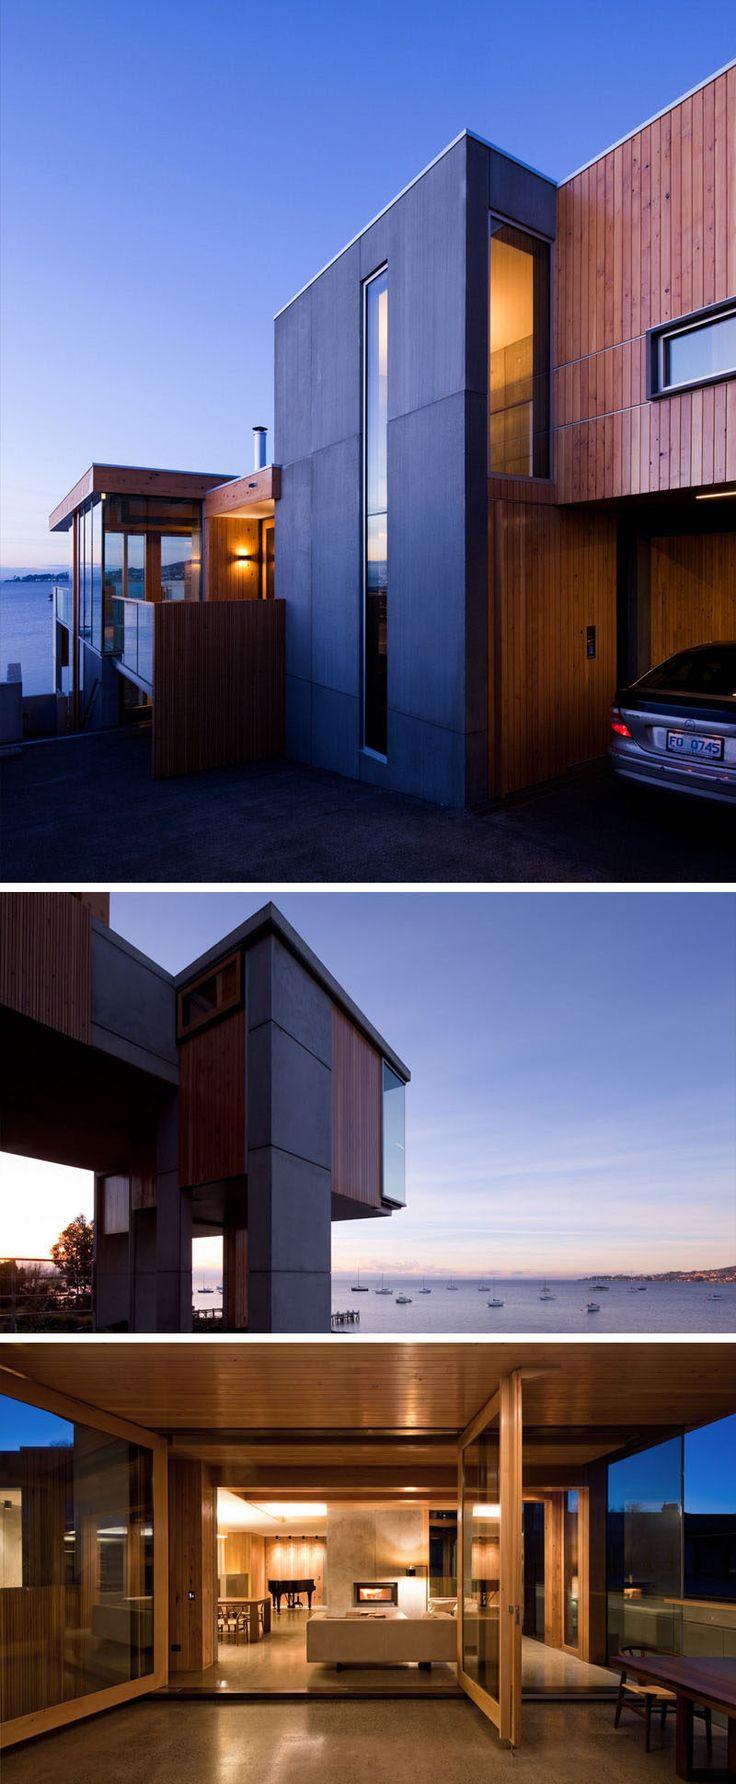 Modern Residential House Bungalow Exterior By Sagar: Best 25+ Modern Residential Architecture Ideas On Pinterest